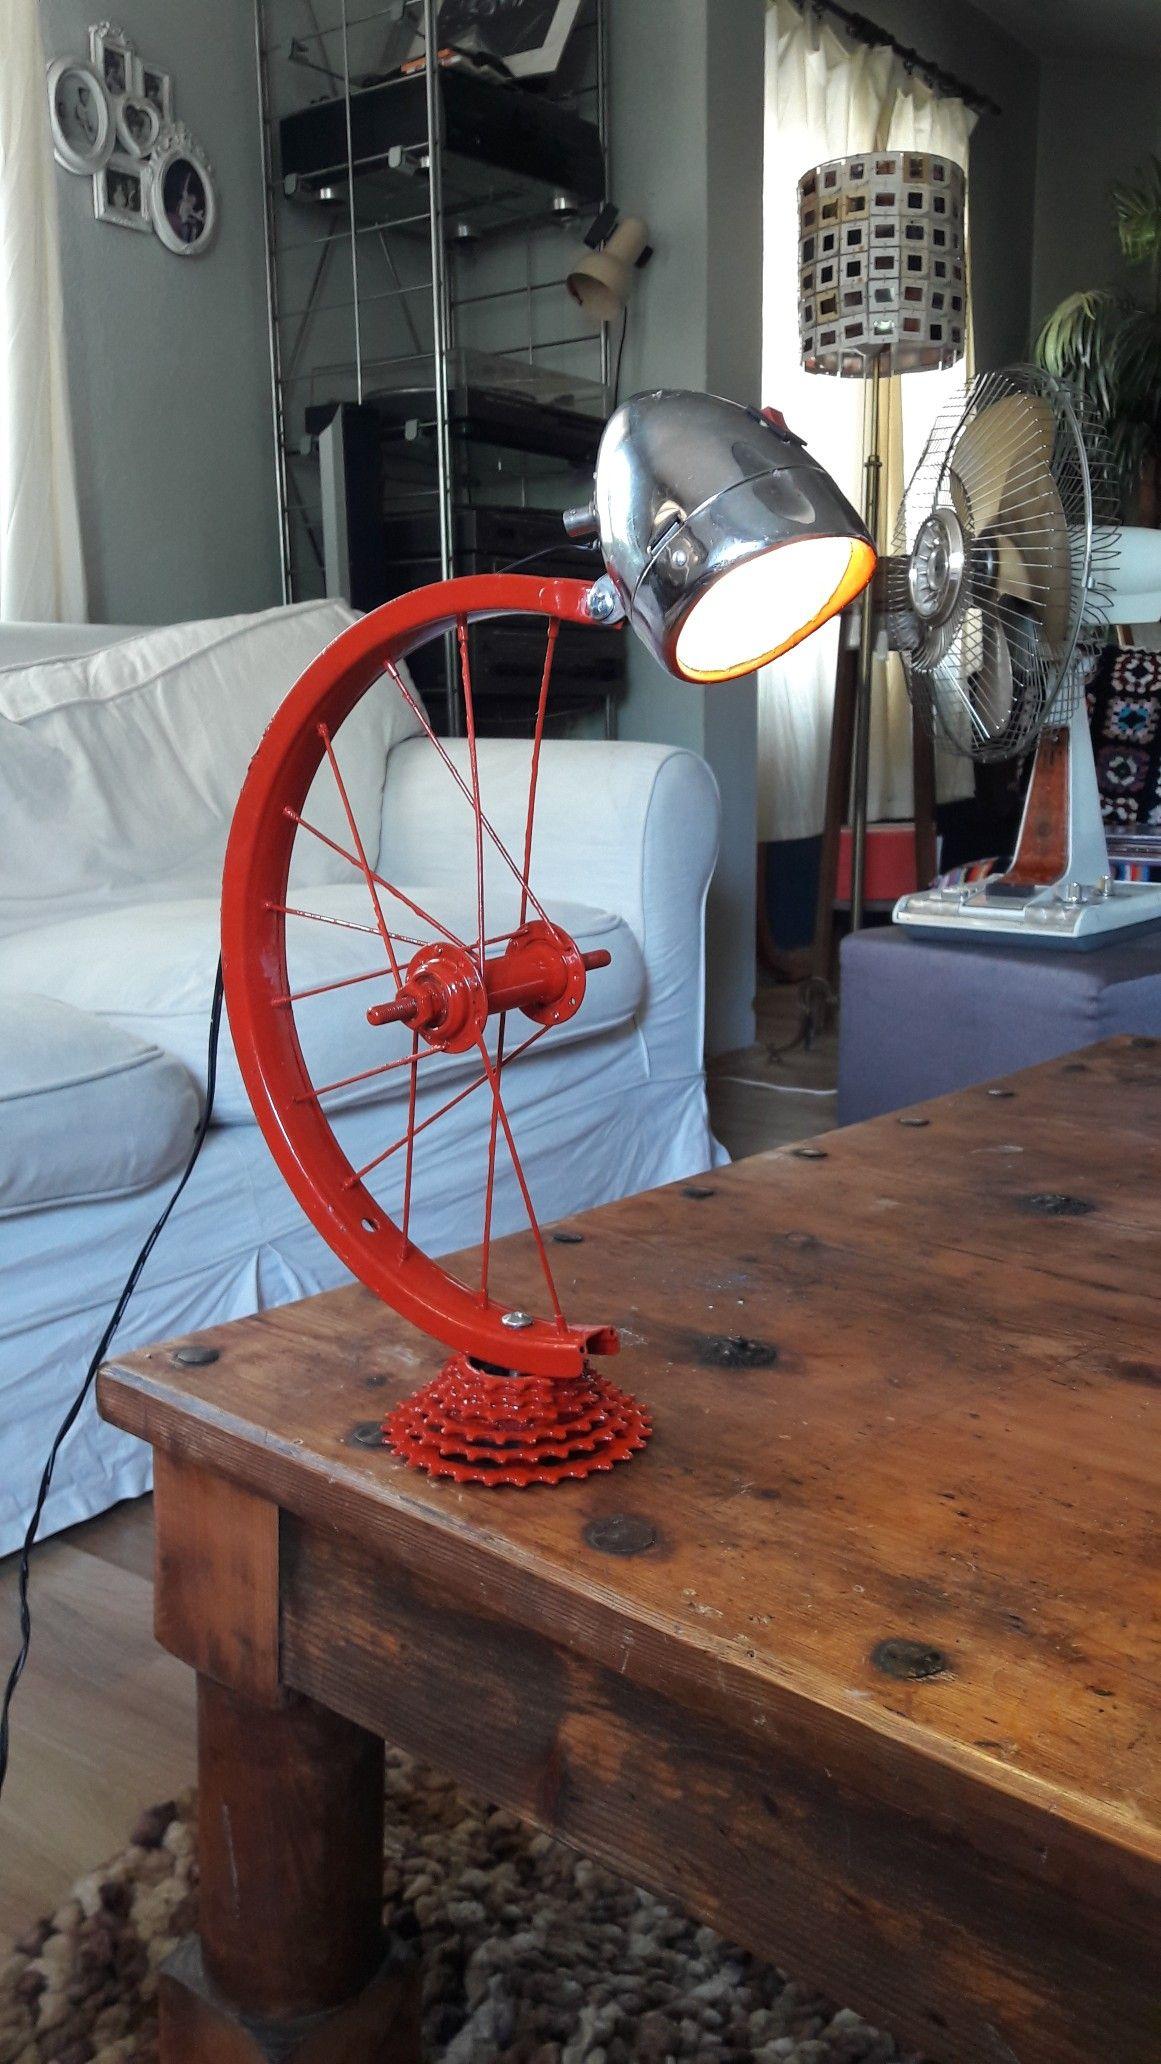 Geridönüşüm bisiklet tekerinden aydınlatma-Upcycled bike parts